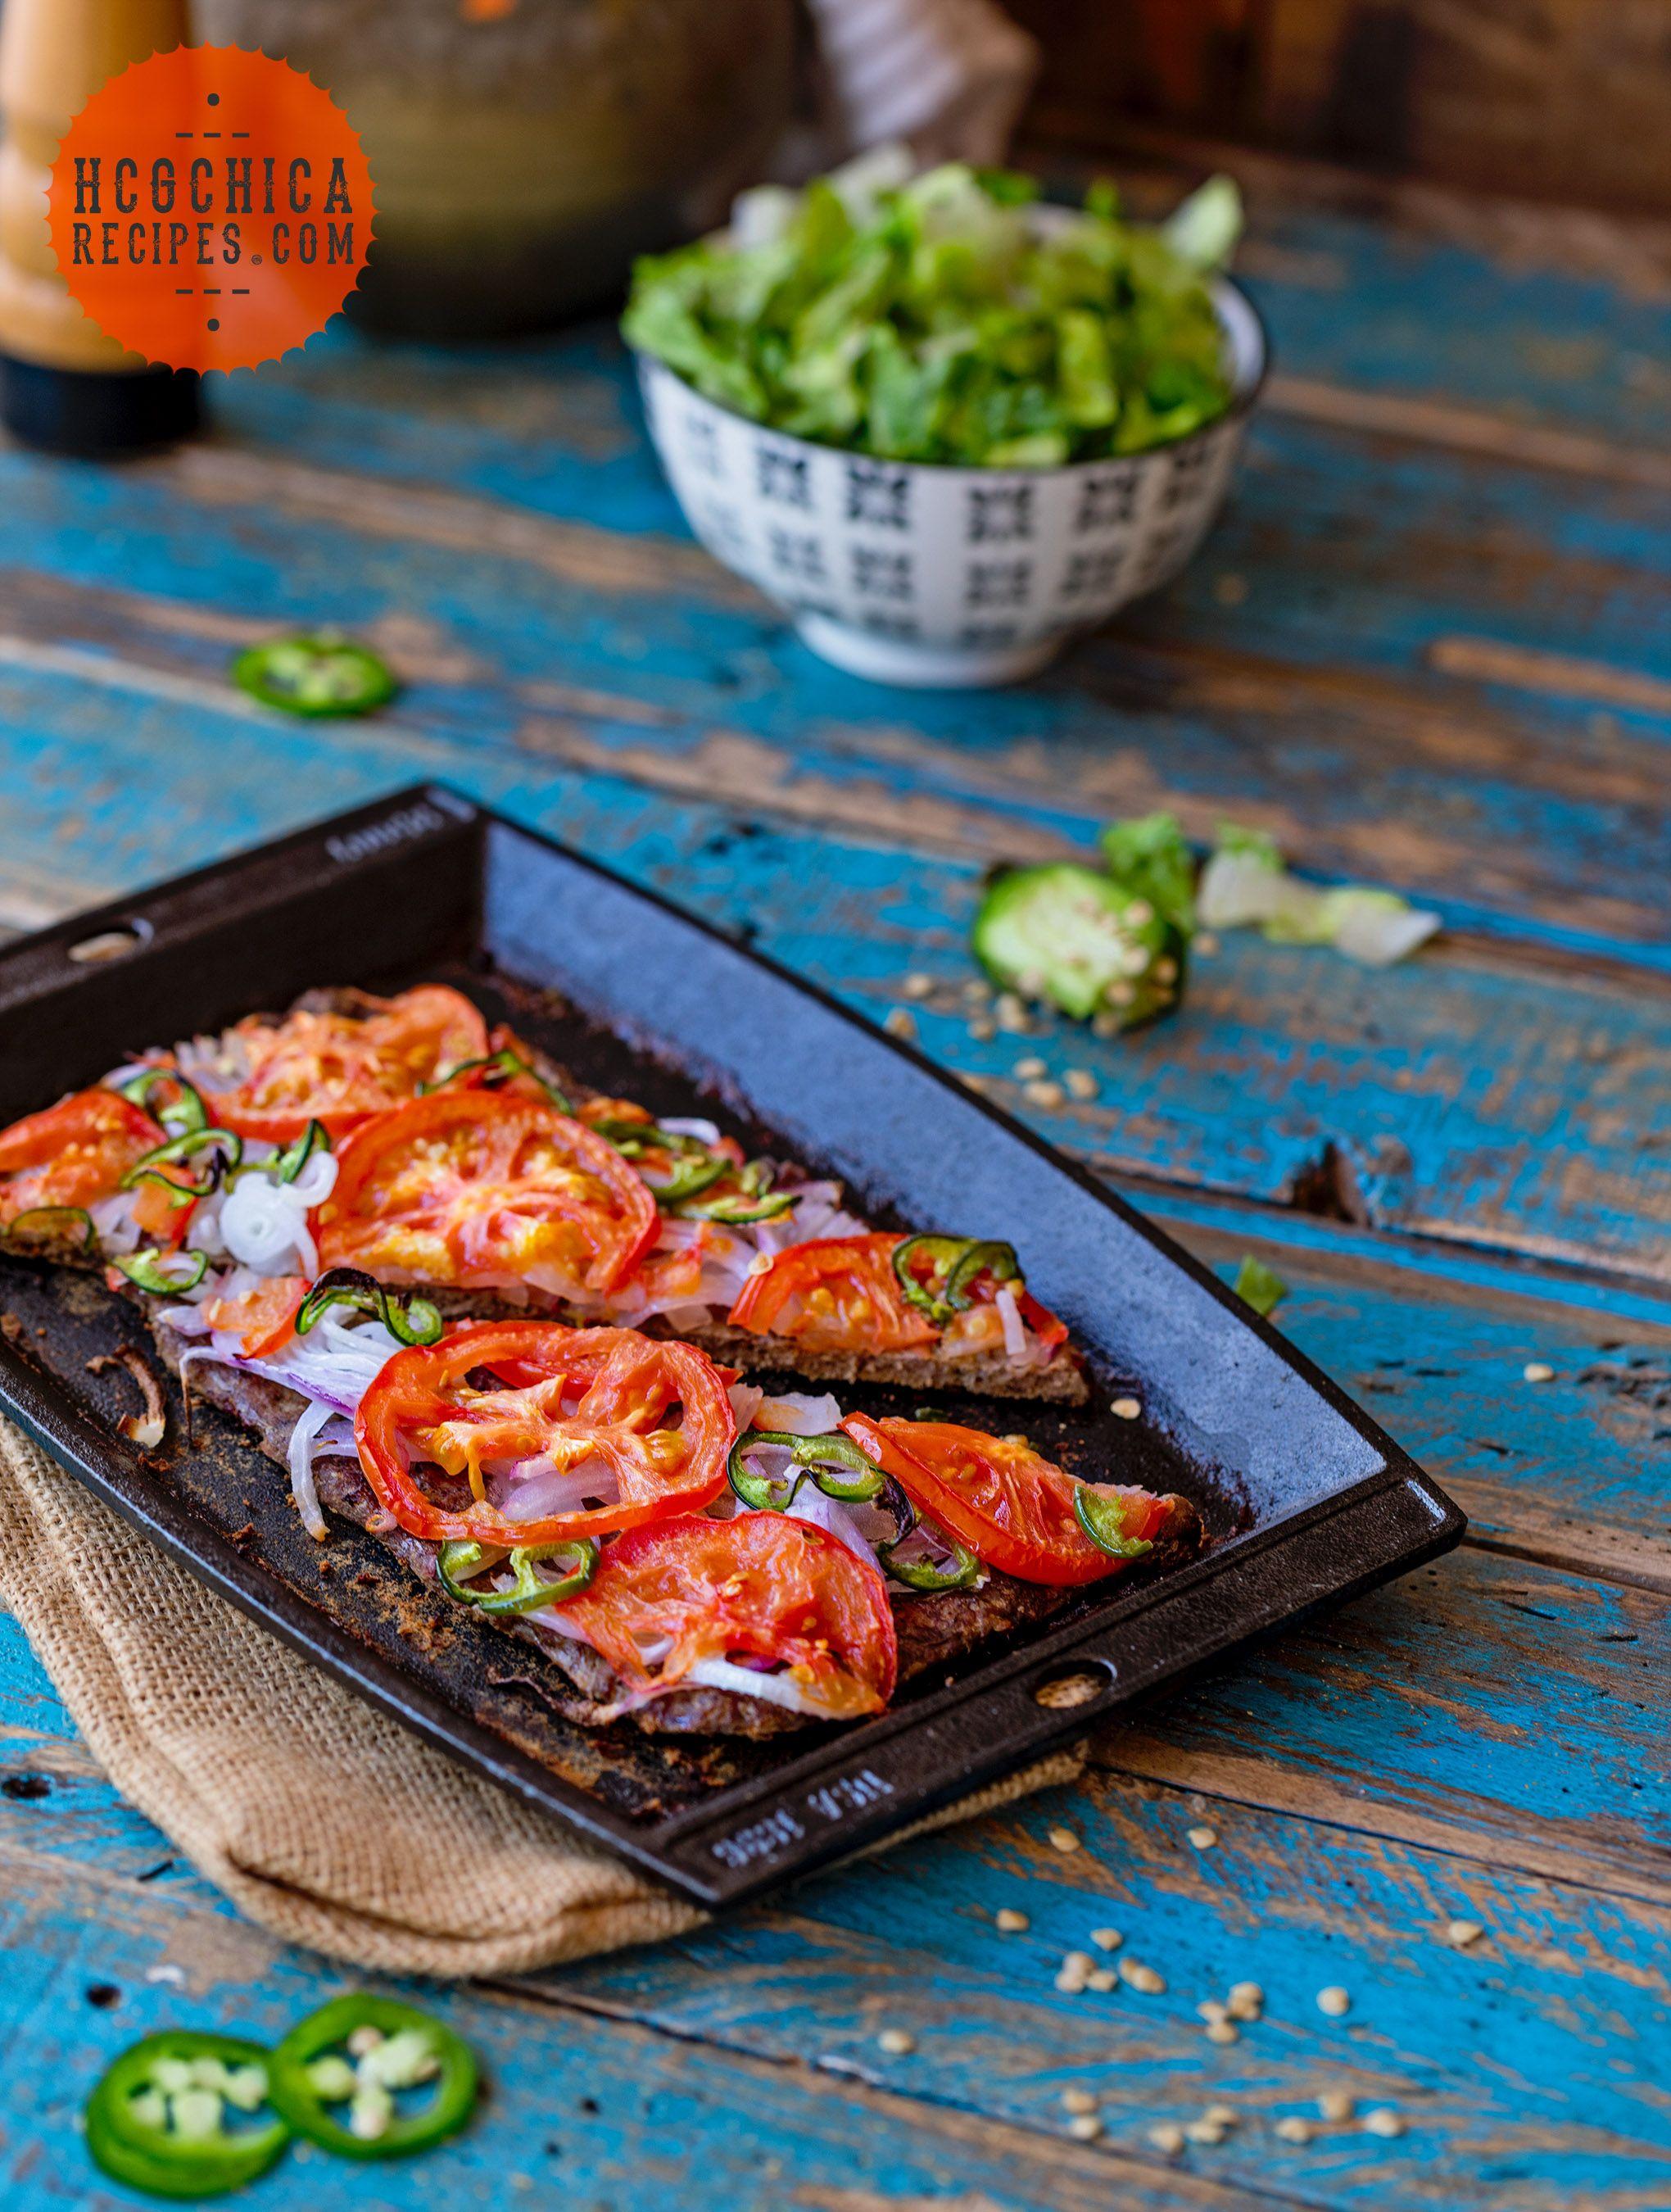 Phase 2 Hcg Diet Recipe Taco Meatza Ap Recipe In 2020 Beef